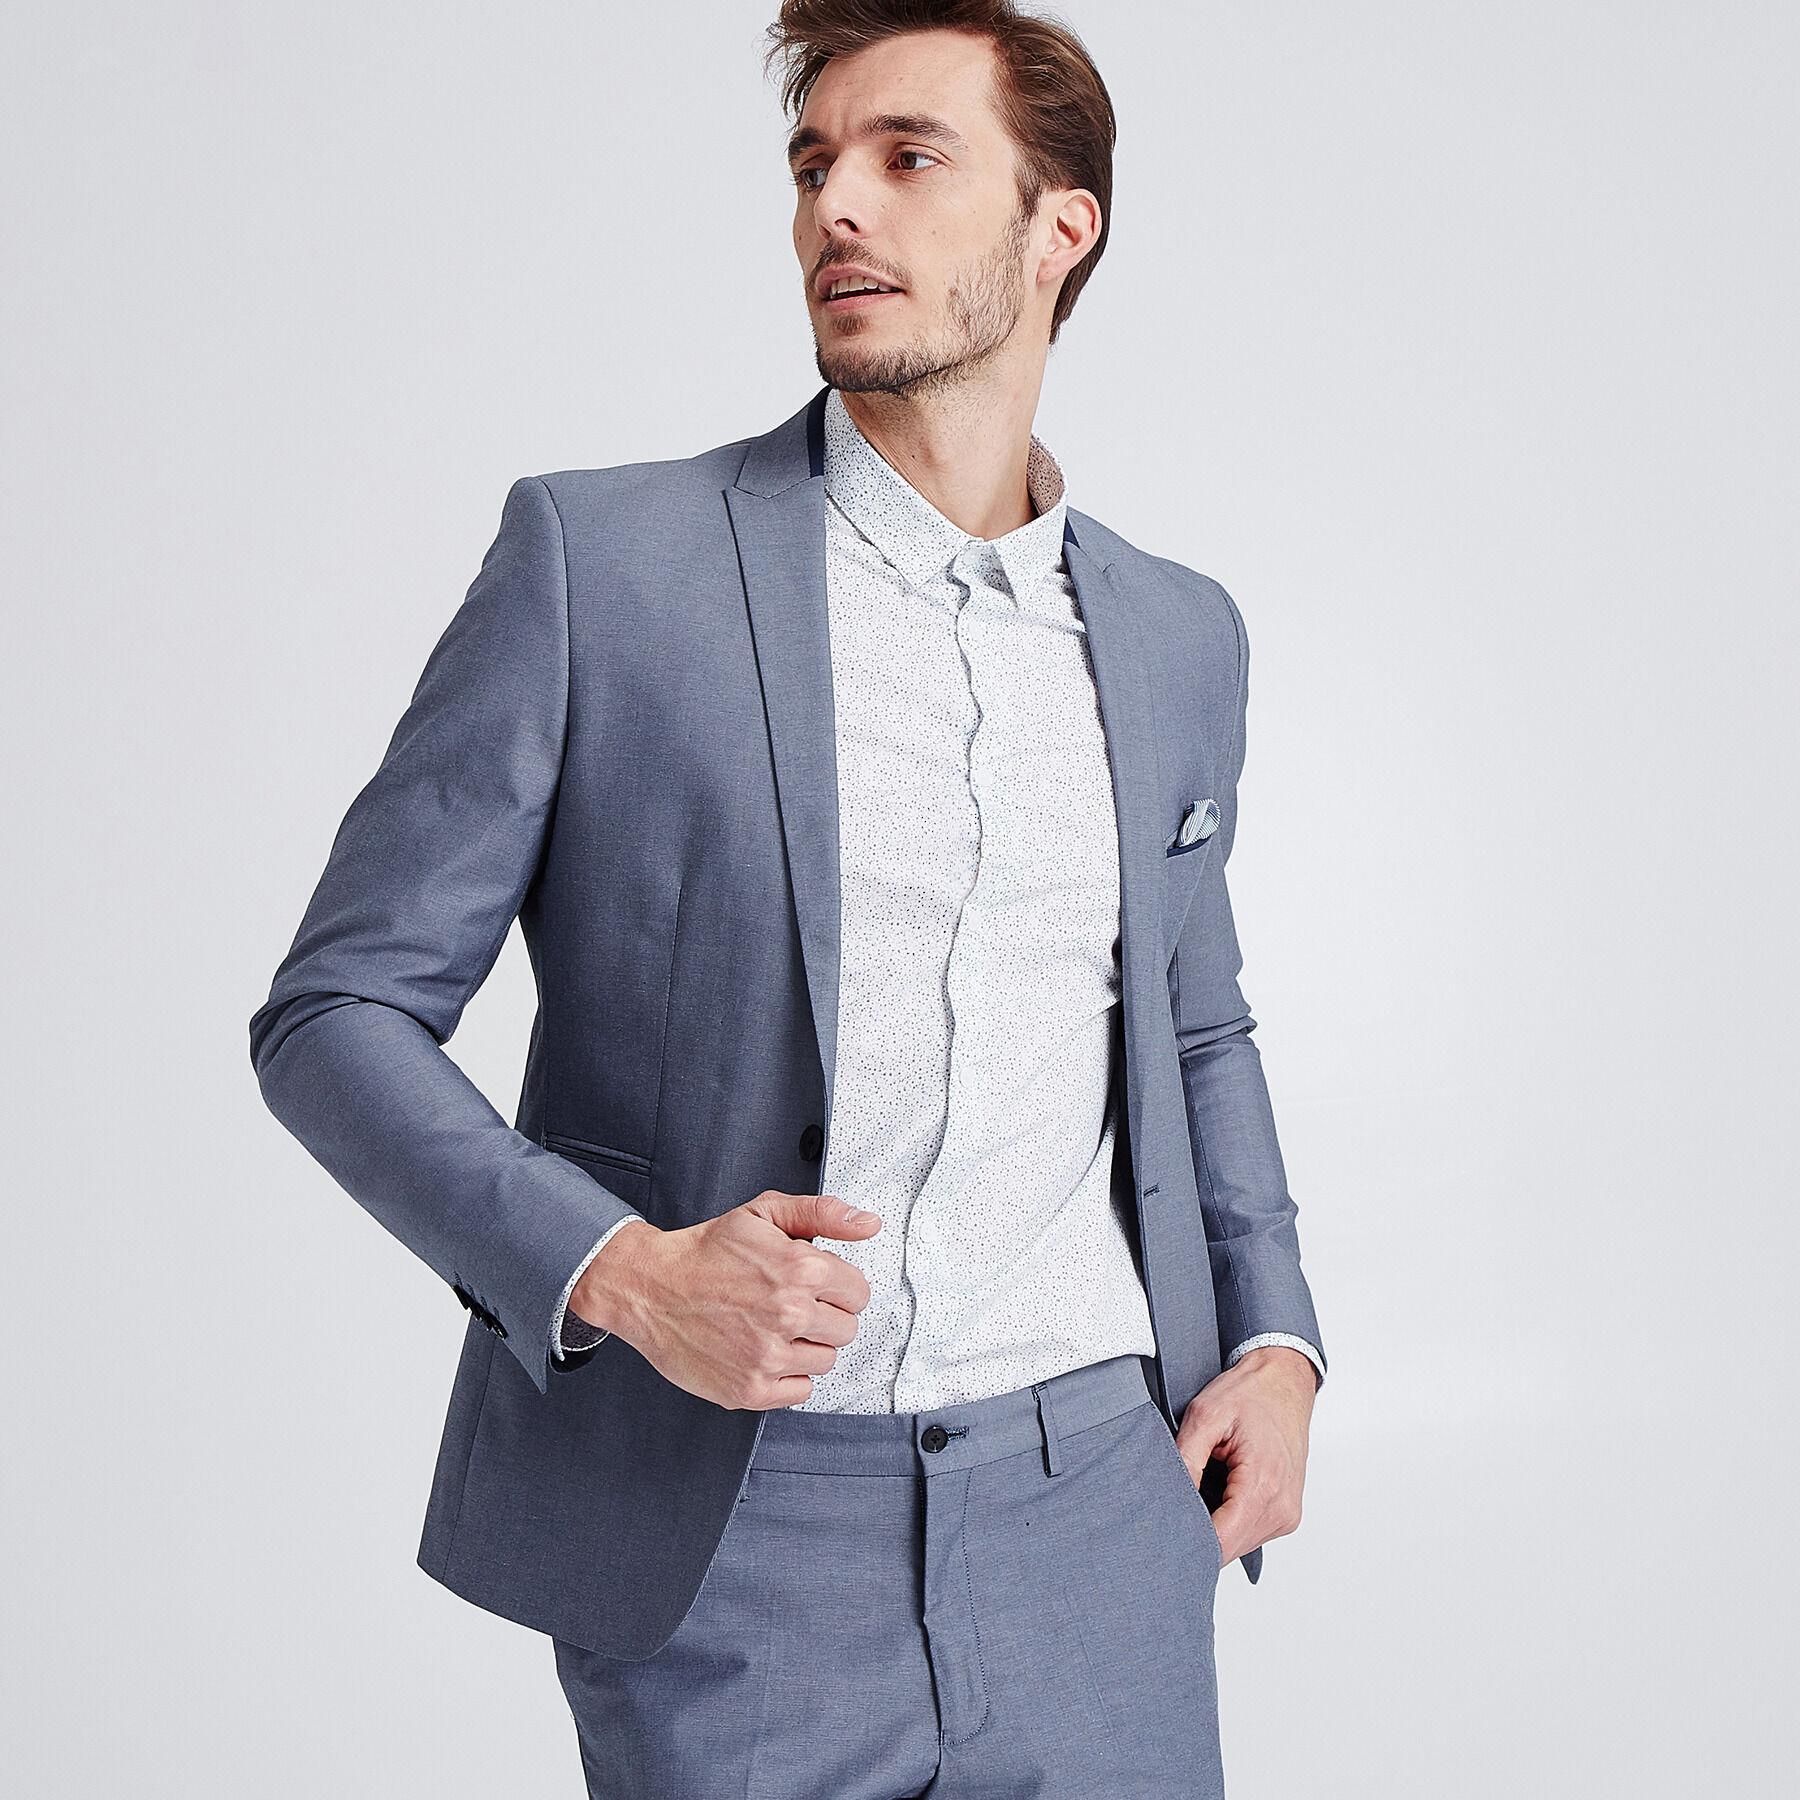 Veste costume homme petite taille